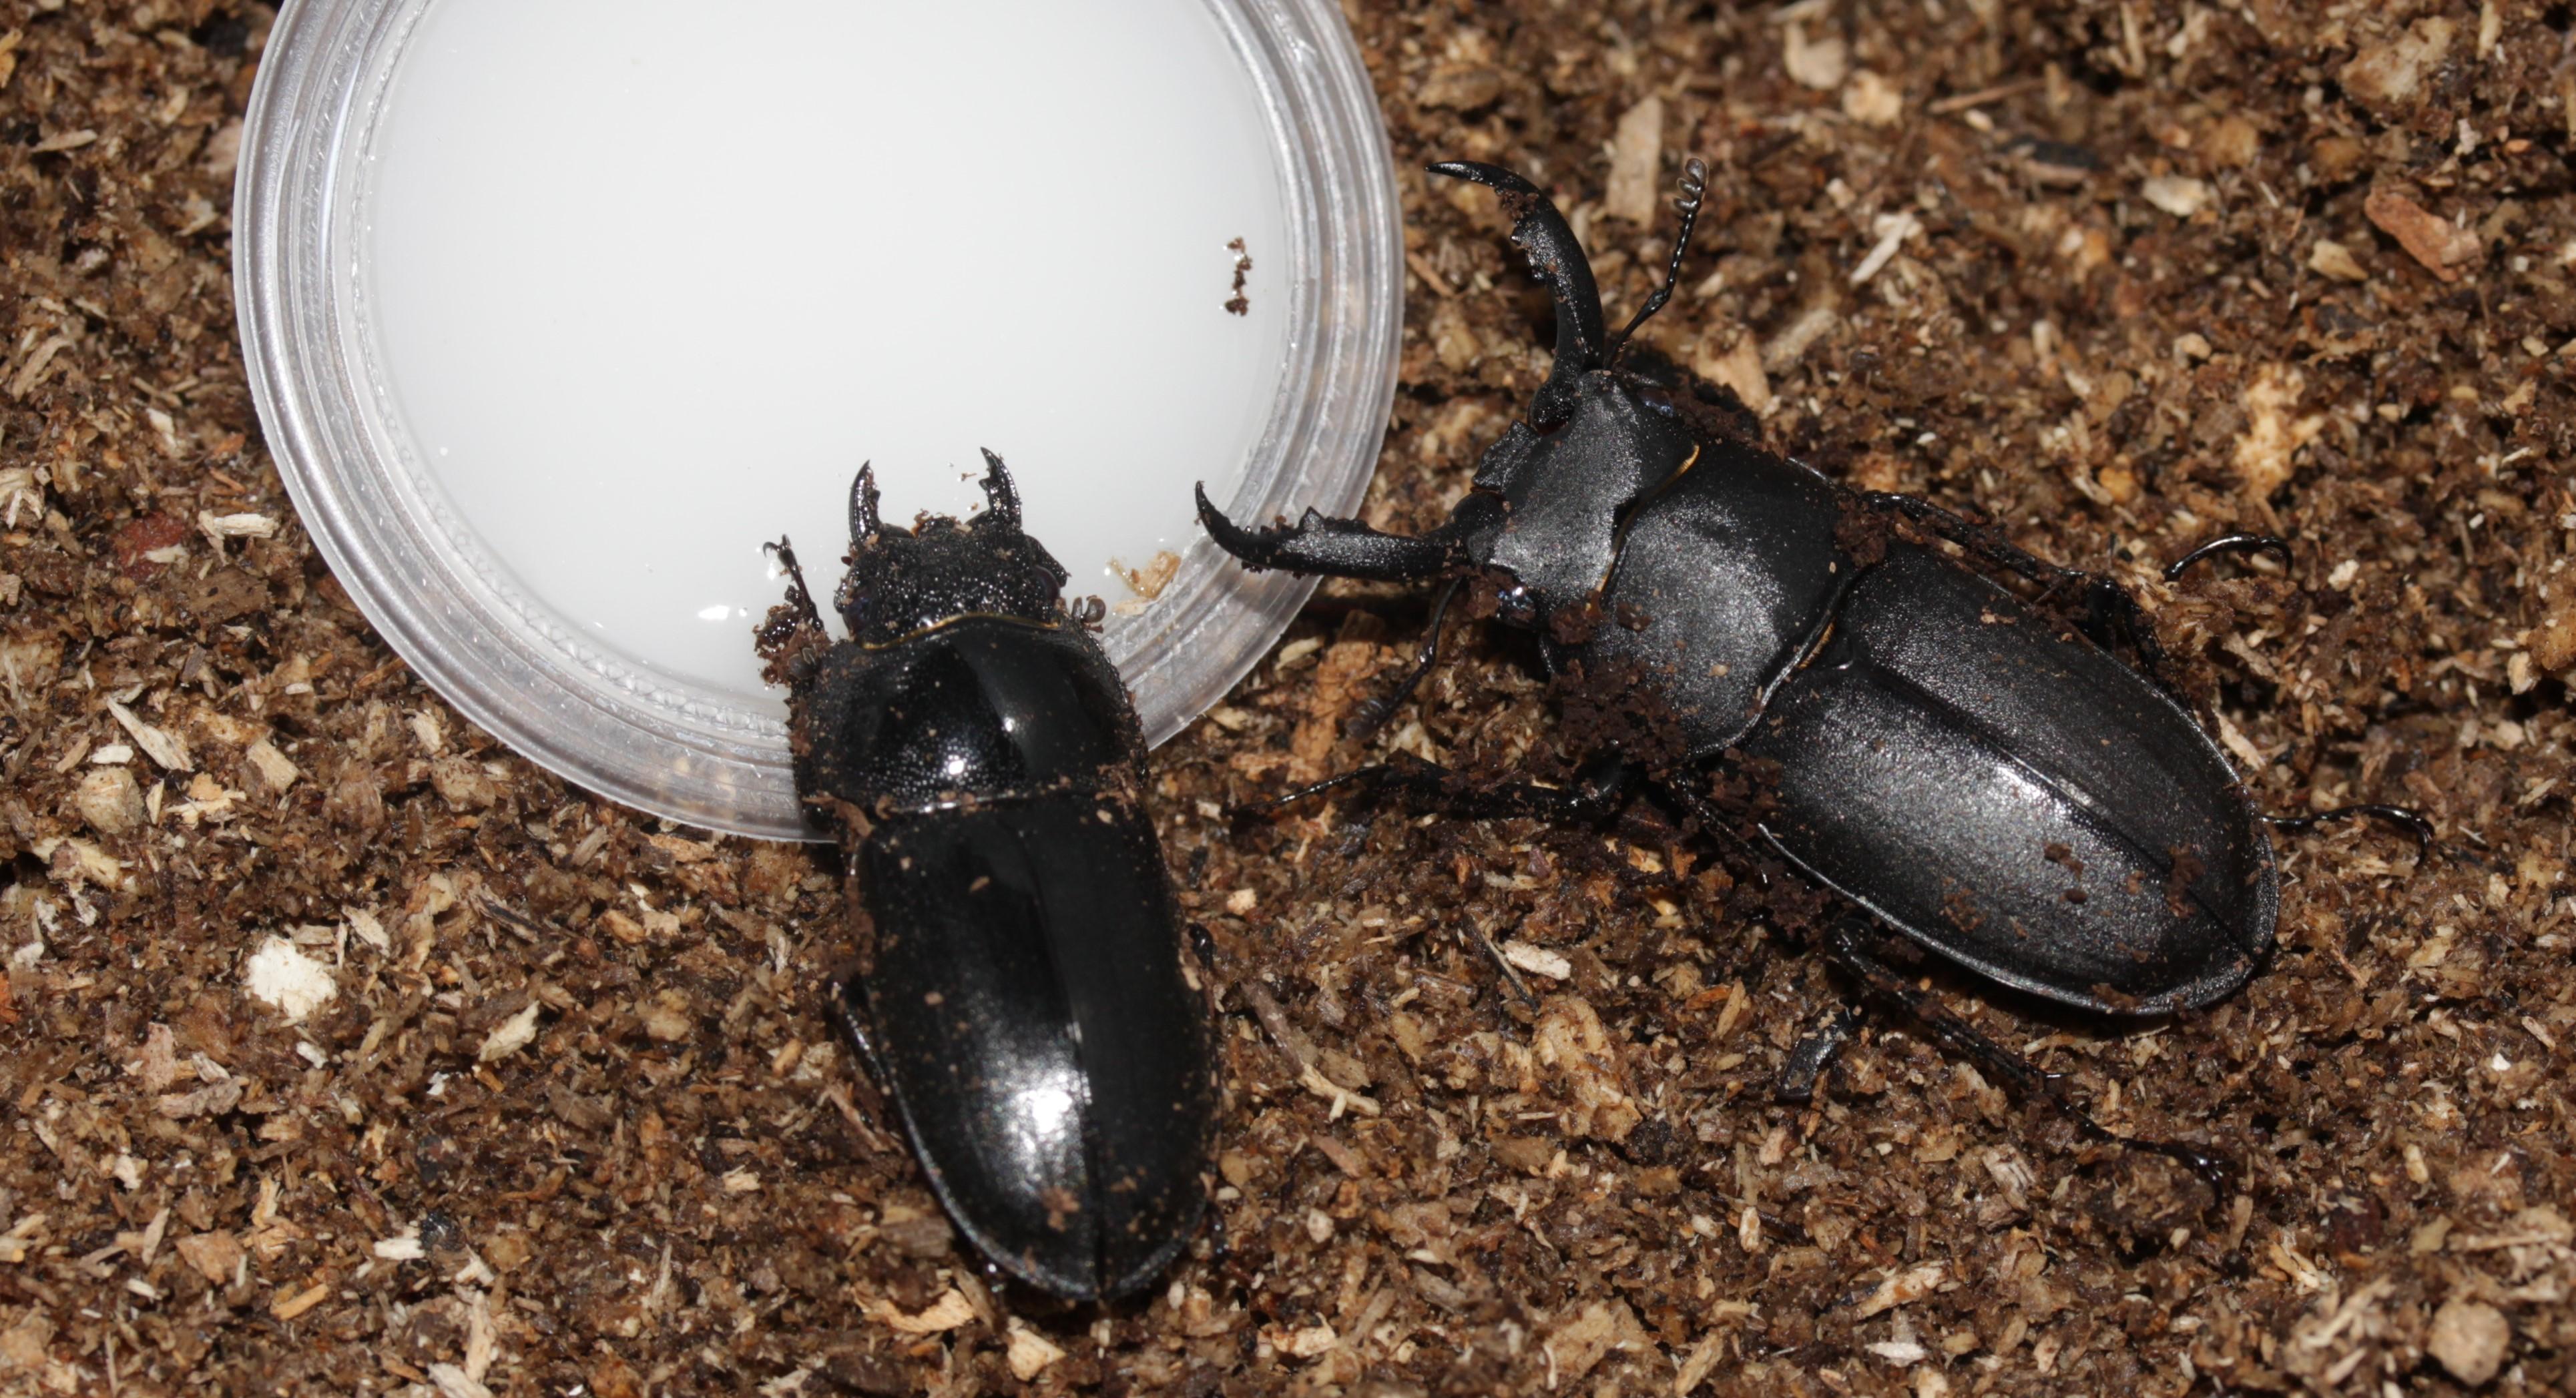 Rhaetulus crenatus recticornis breeding pair, from Amami Oshima Japan